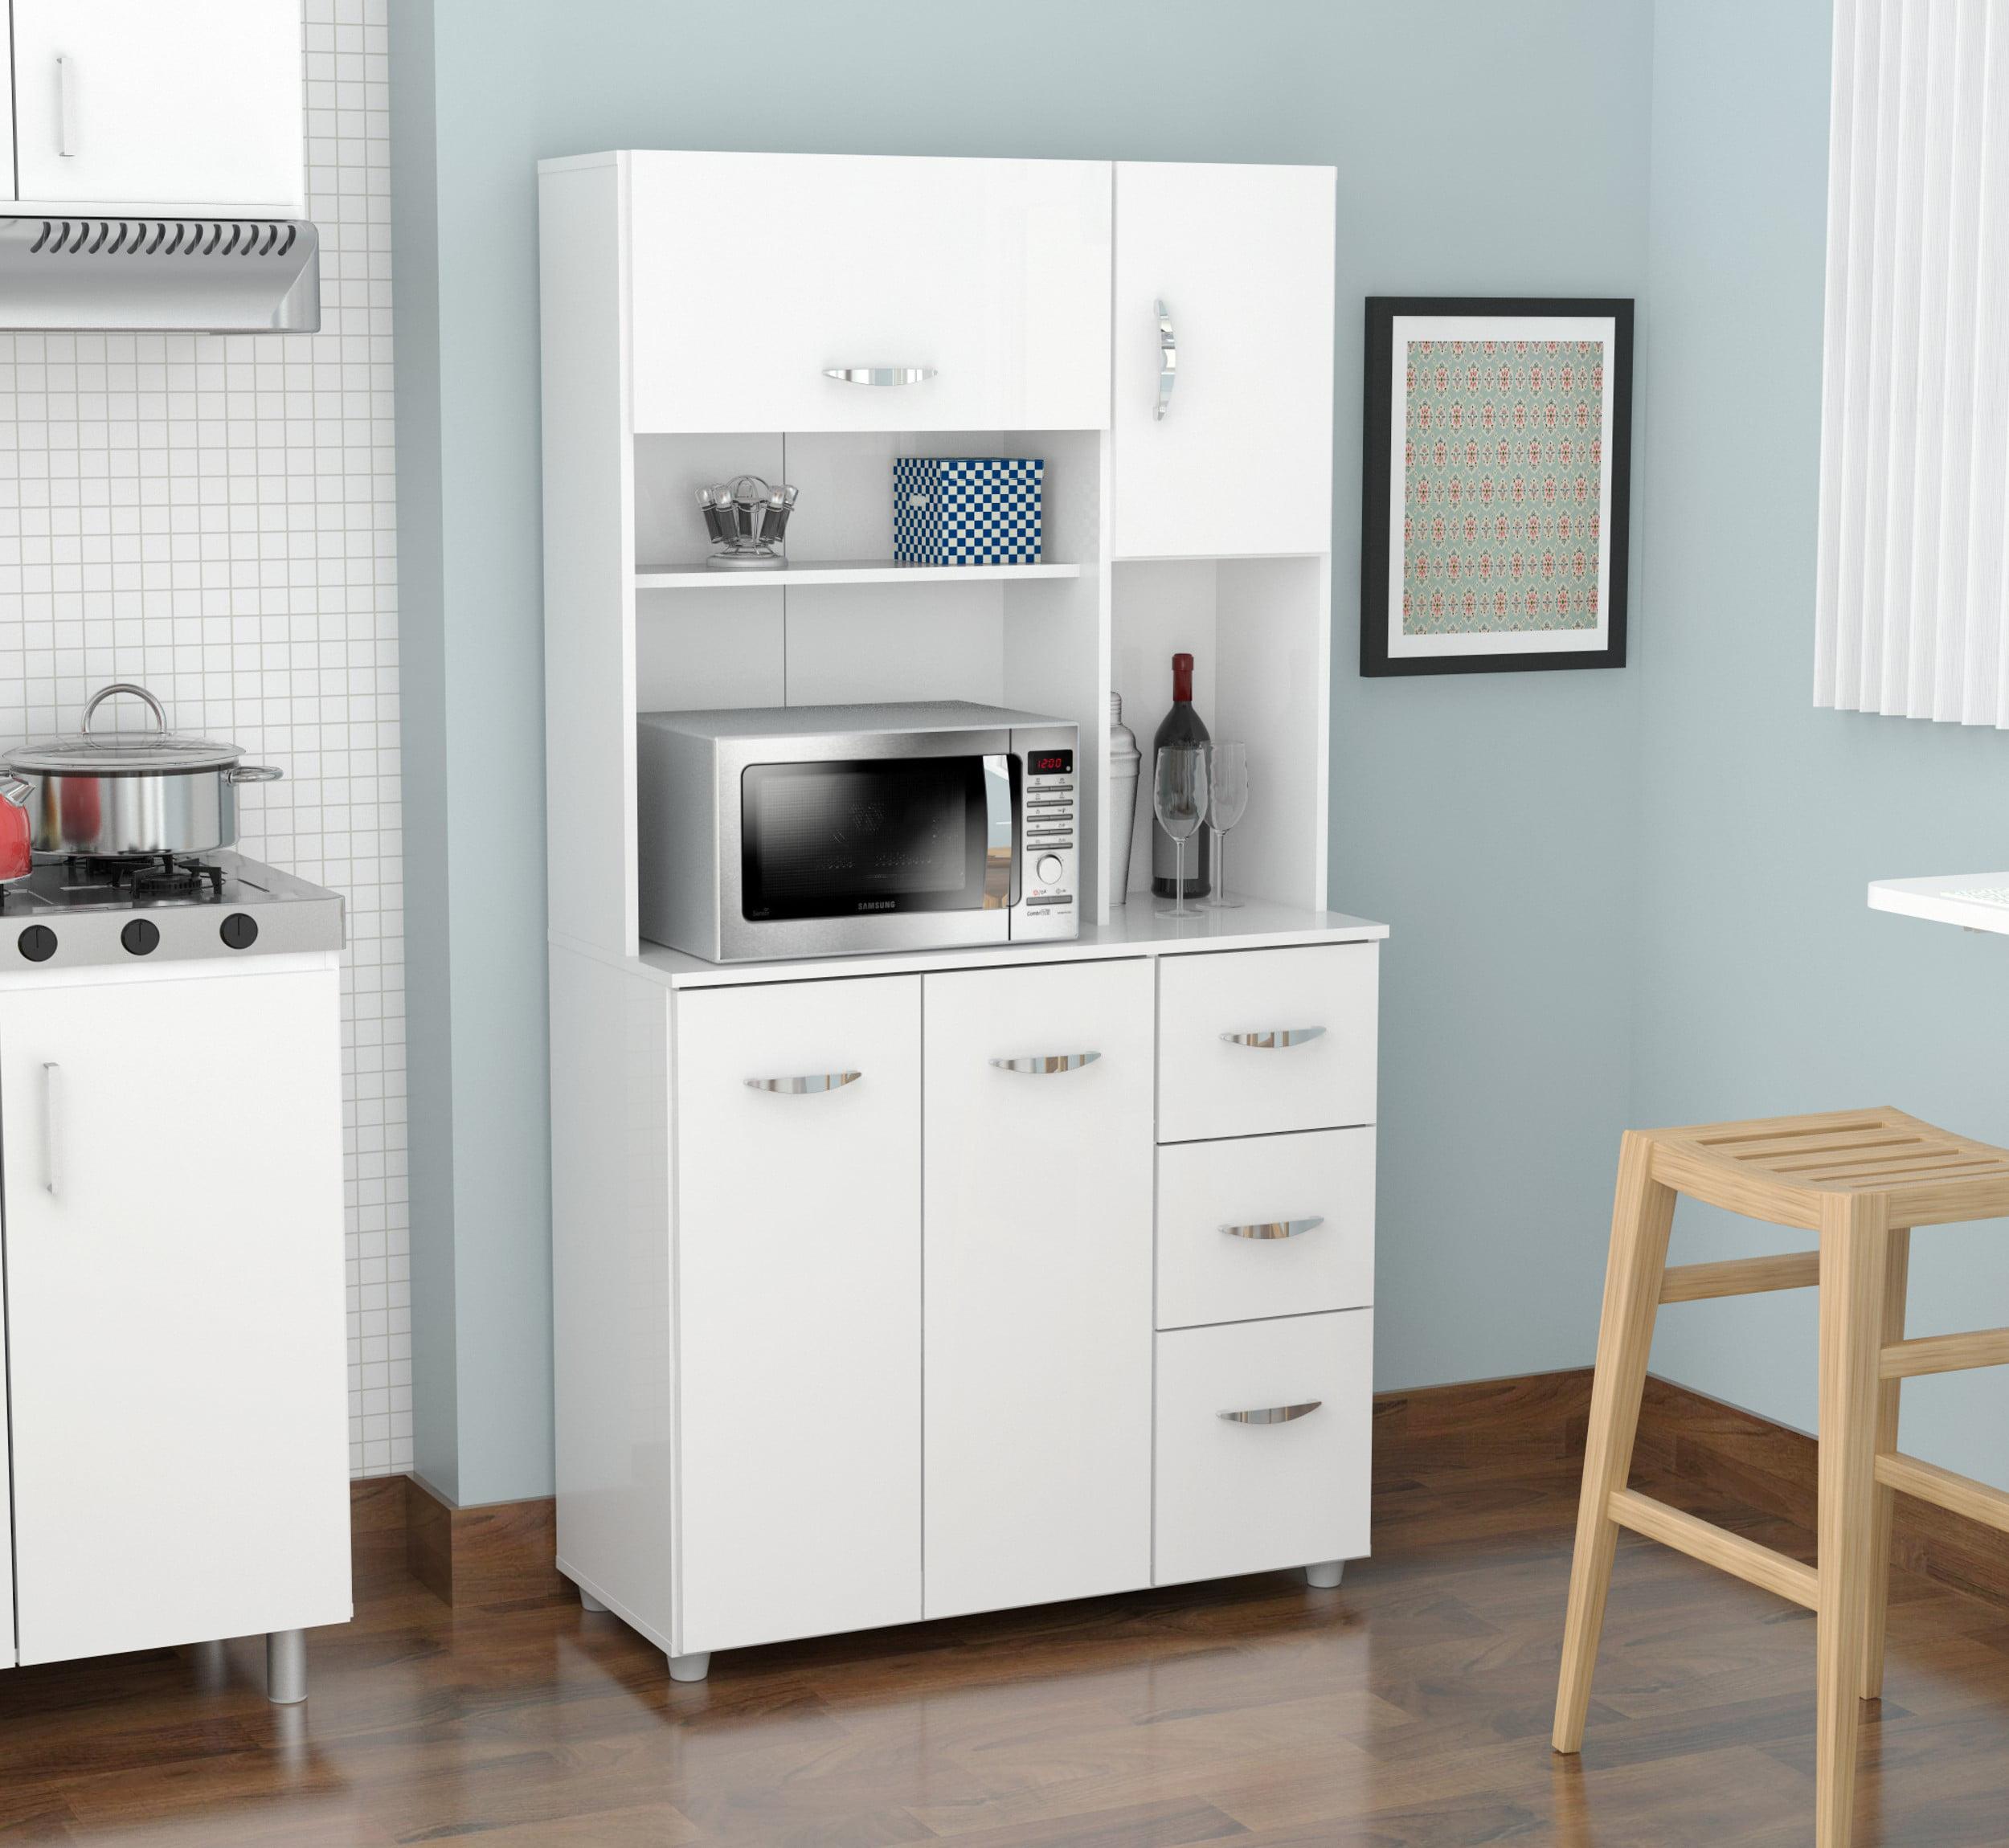 Inval Modern Laricina-white Kitchen Storage Cabinet - Walmart.com